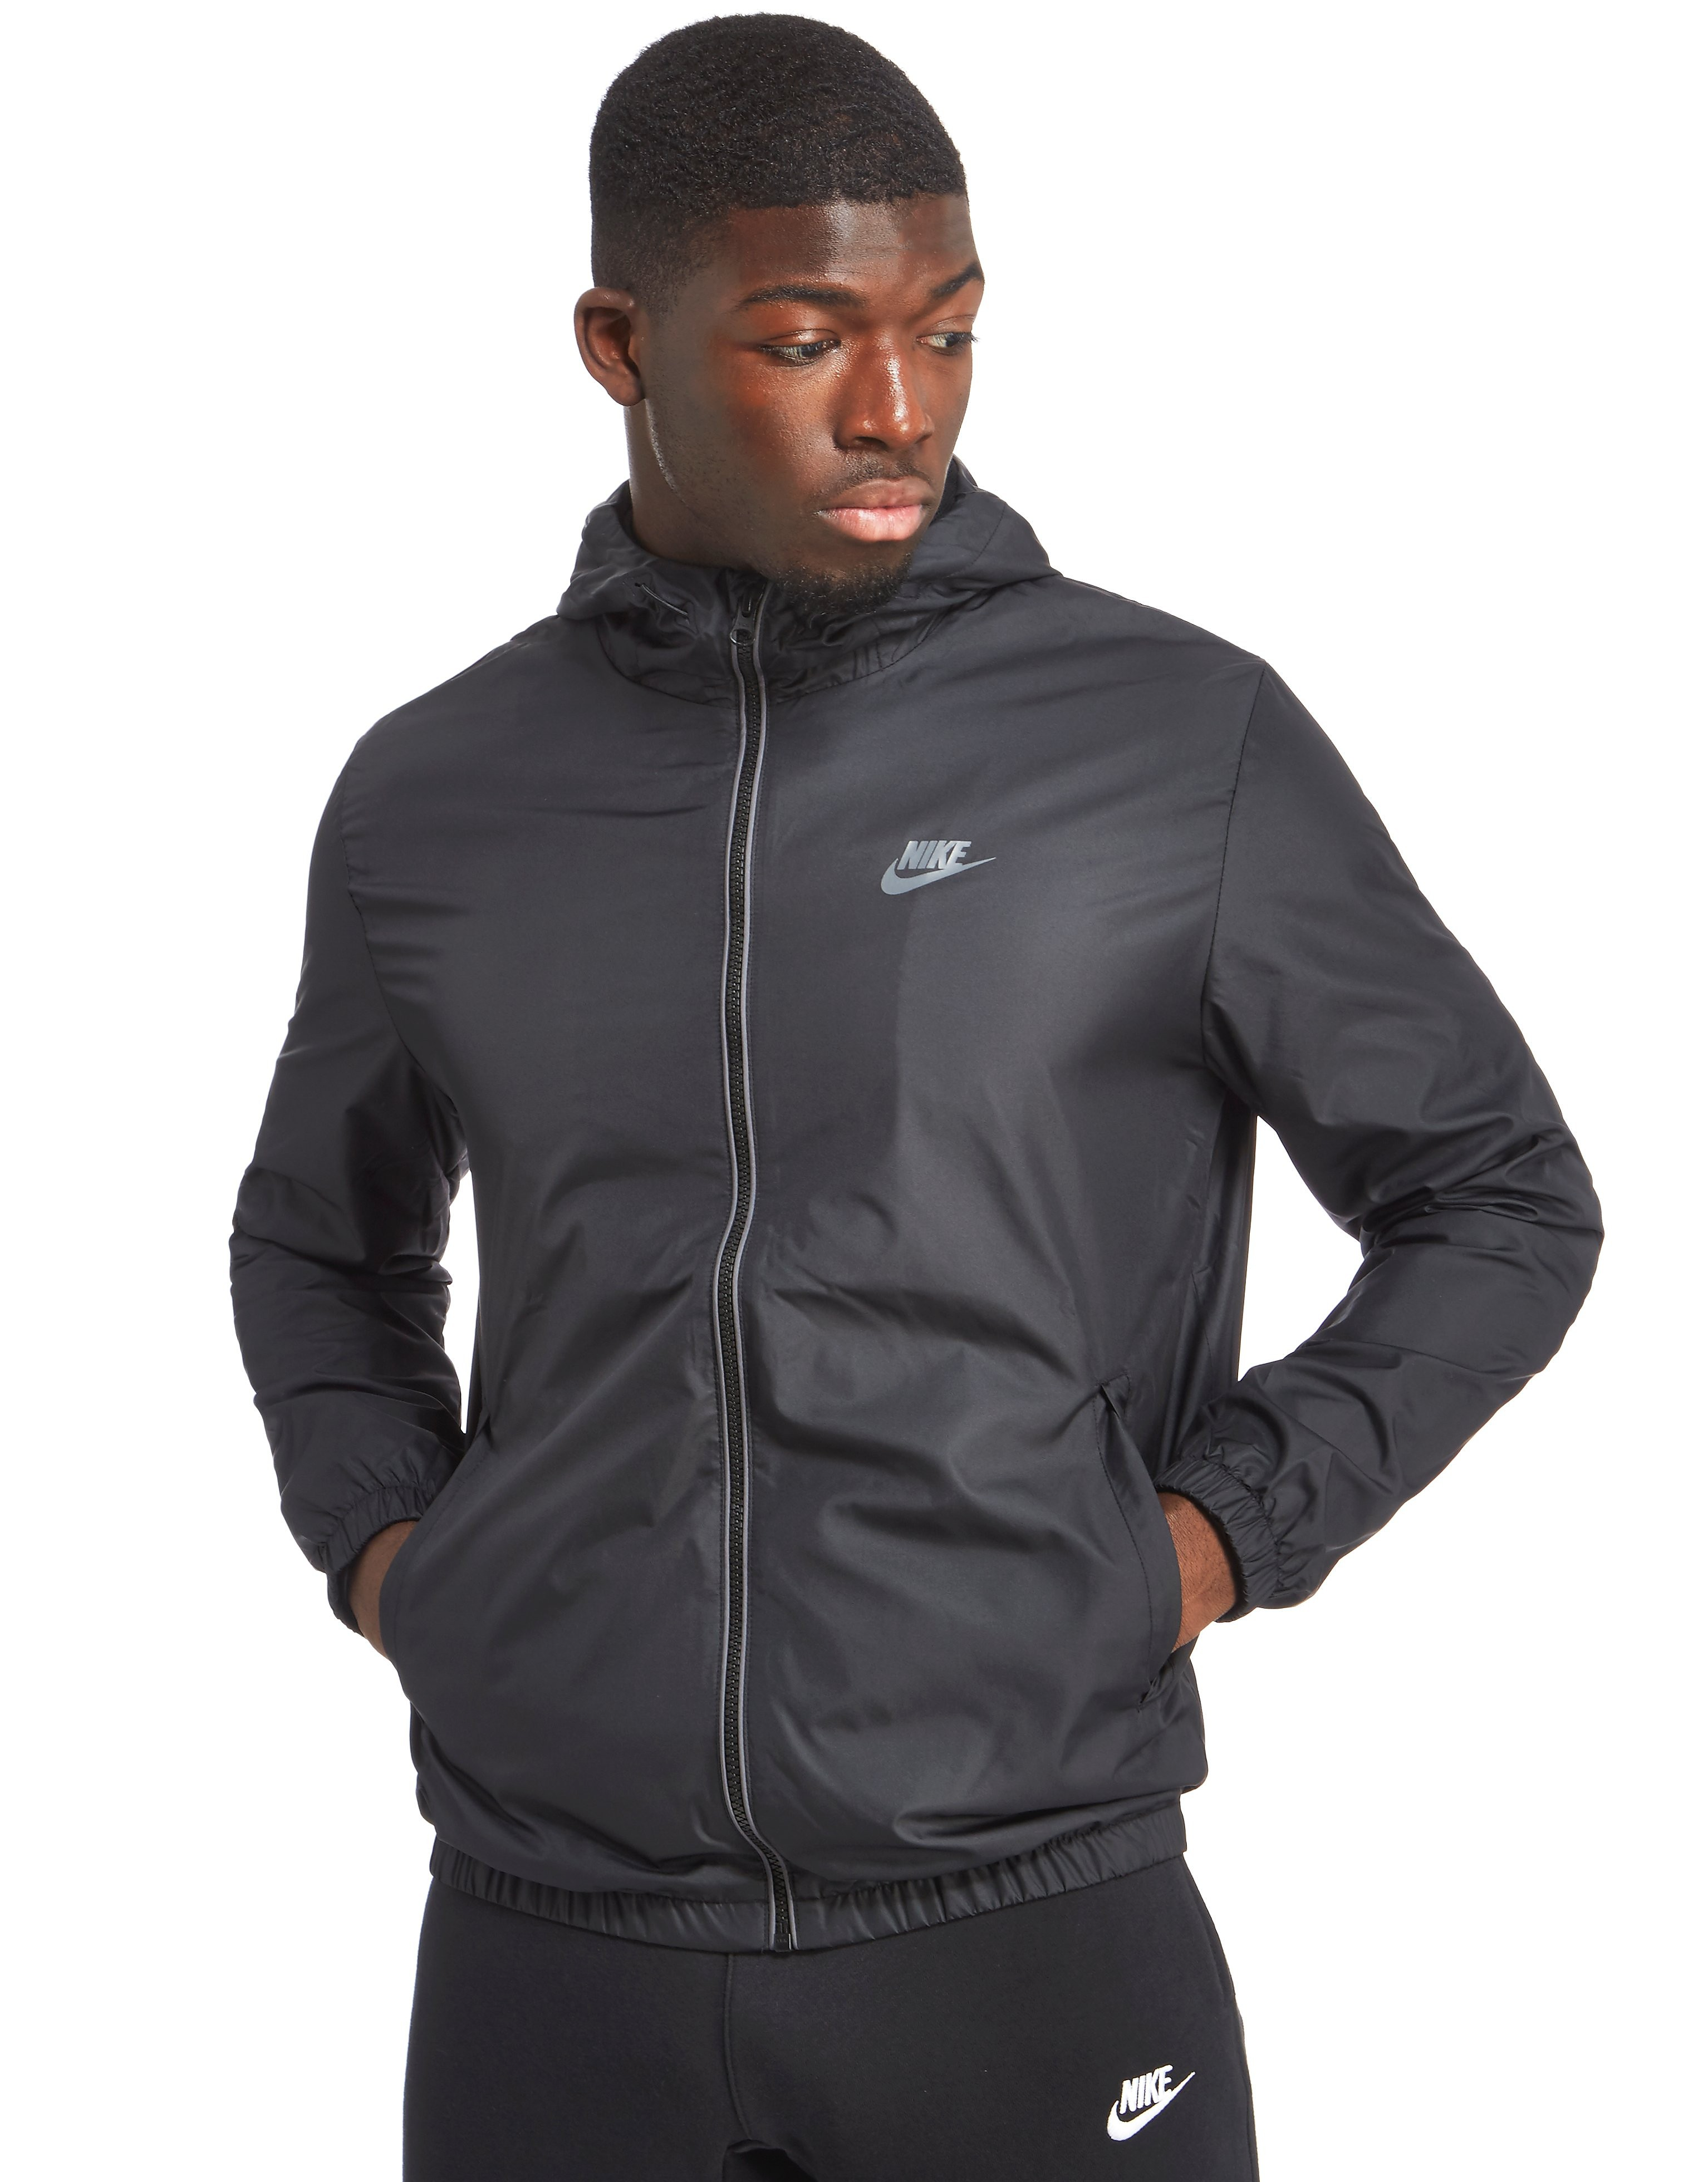 Nike Shutout Jacket